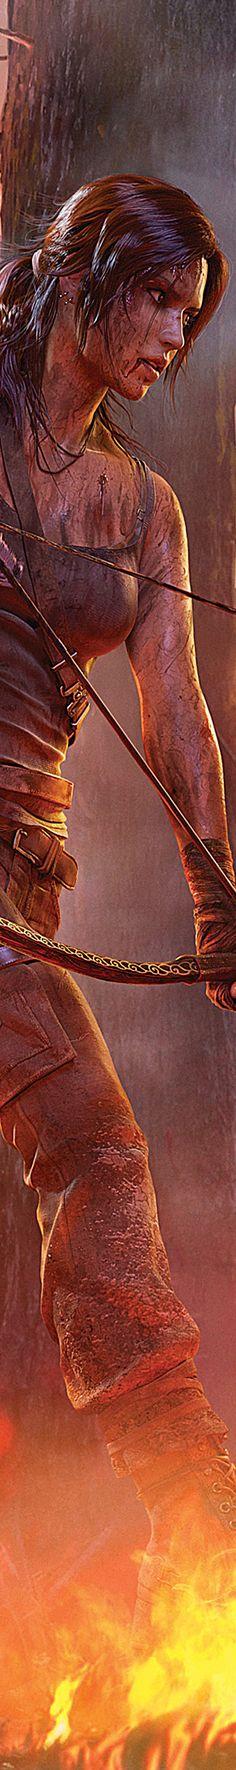 Tomb Raider:  All New Lara Croft ~ #Tomb #Raider 2013.                                                                                                                                                                                 More